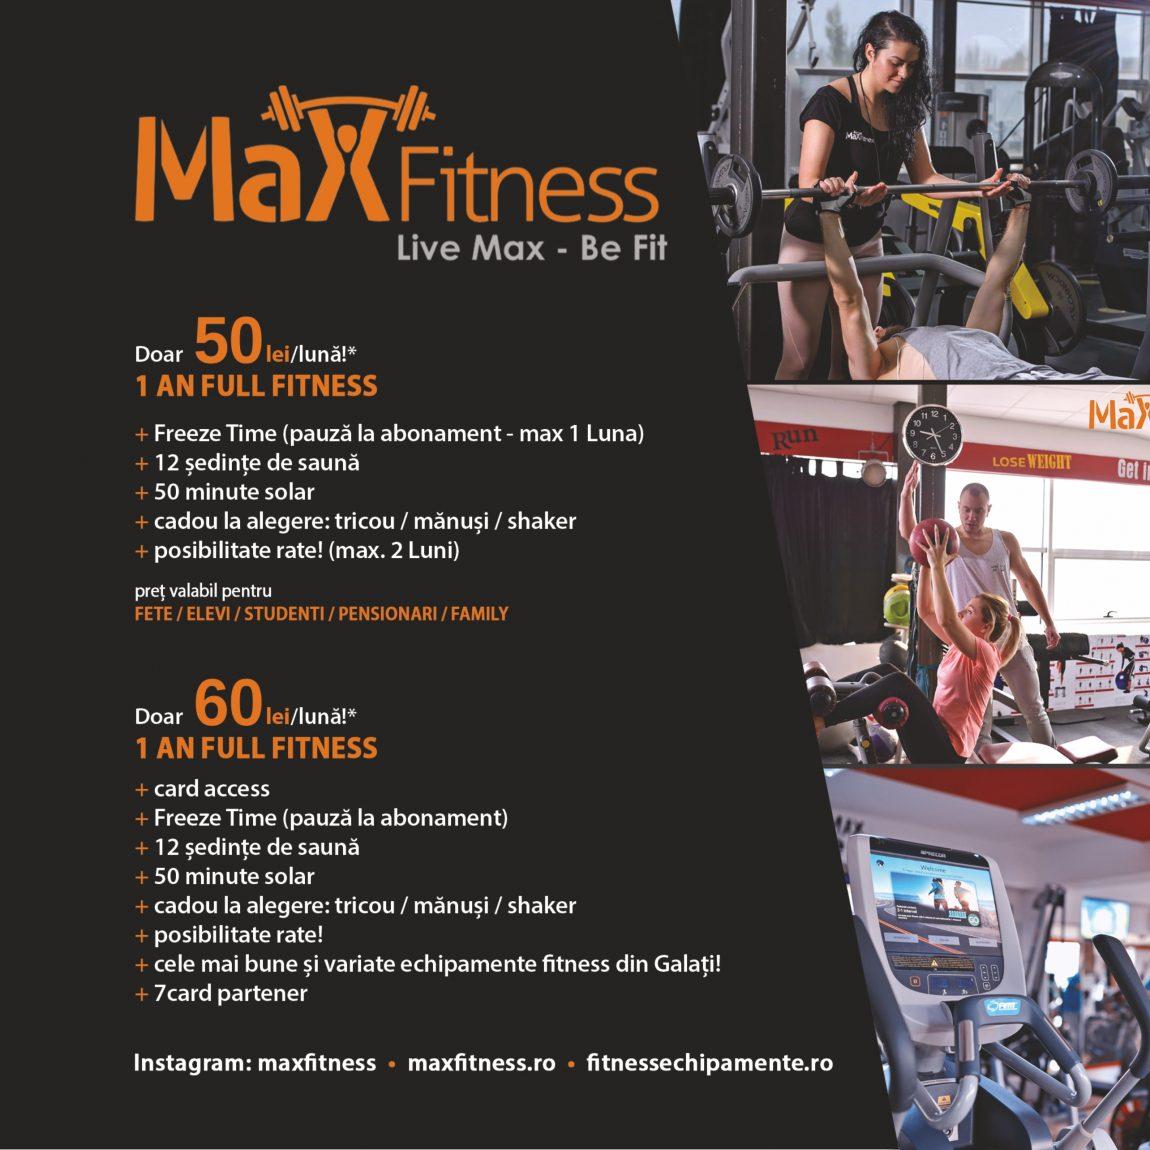 lista-de-preturi-MaxFitness-2.jpg